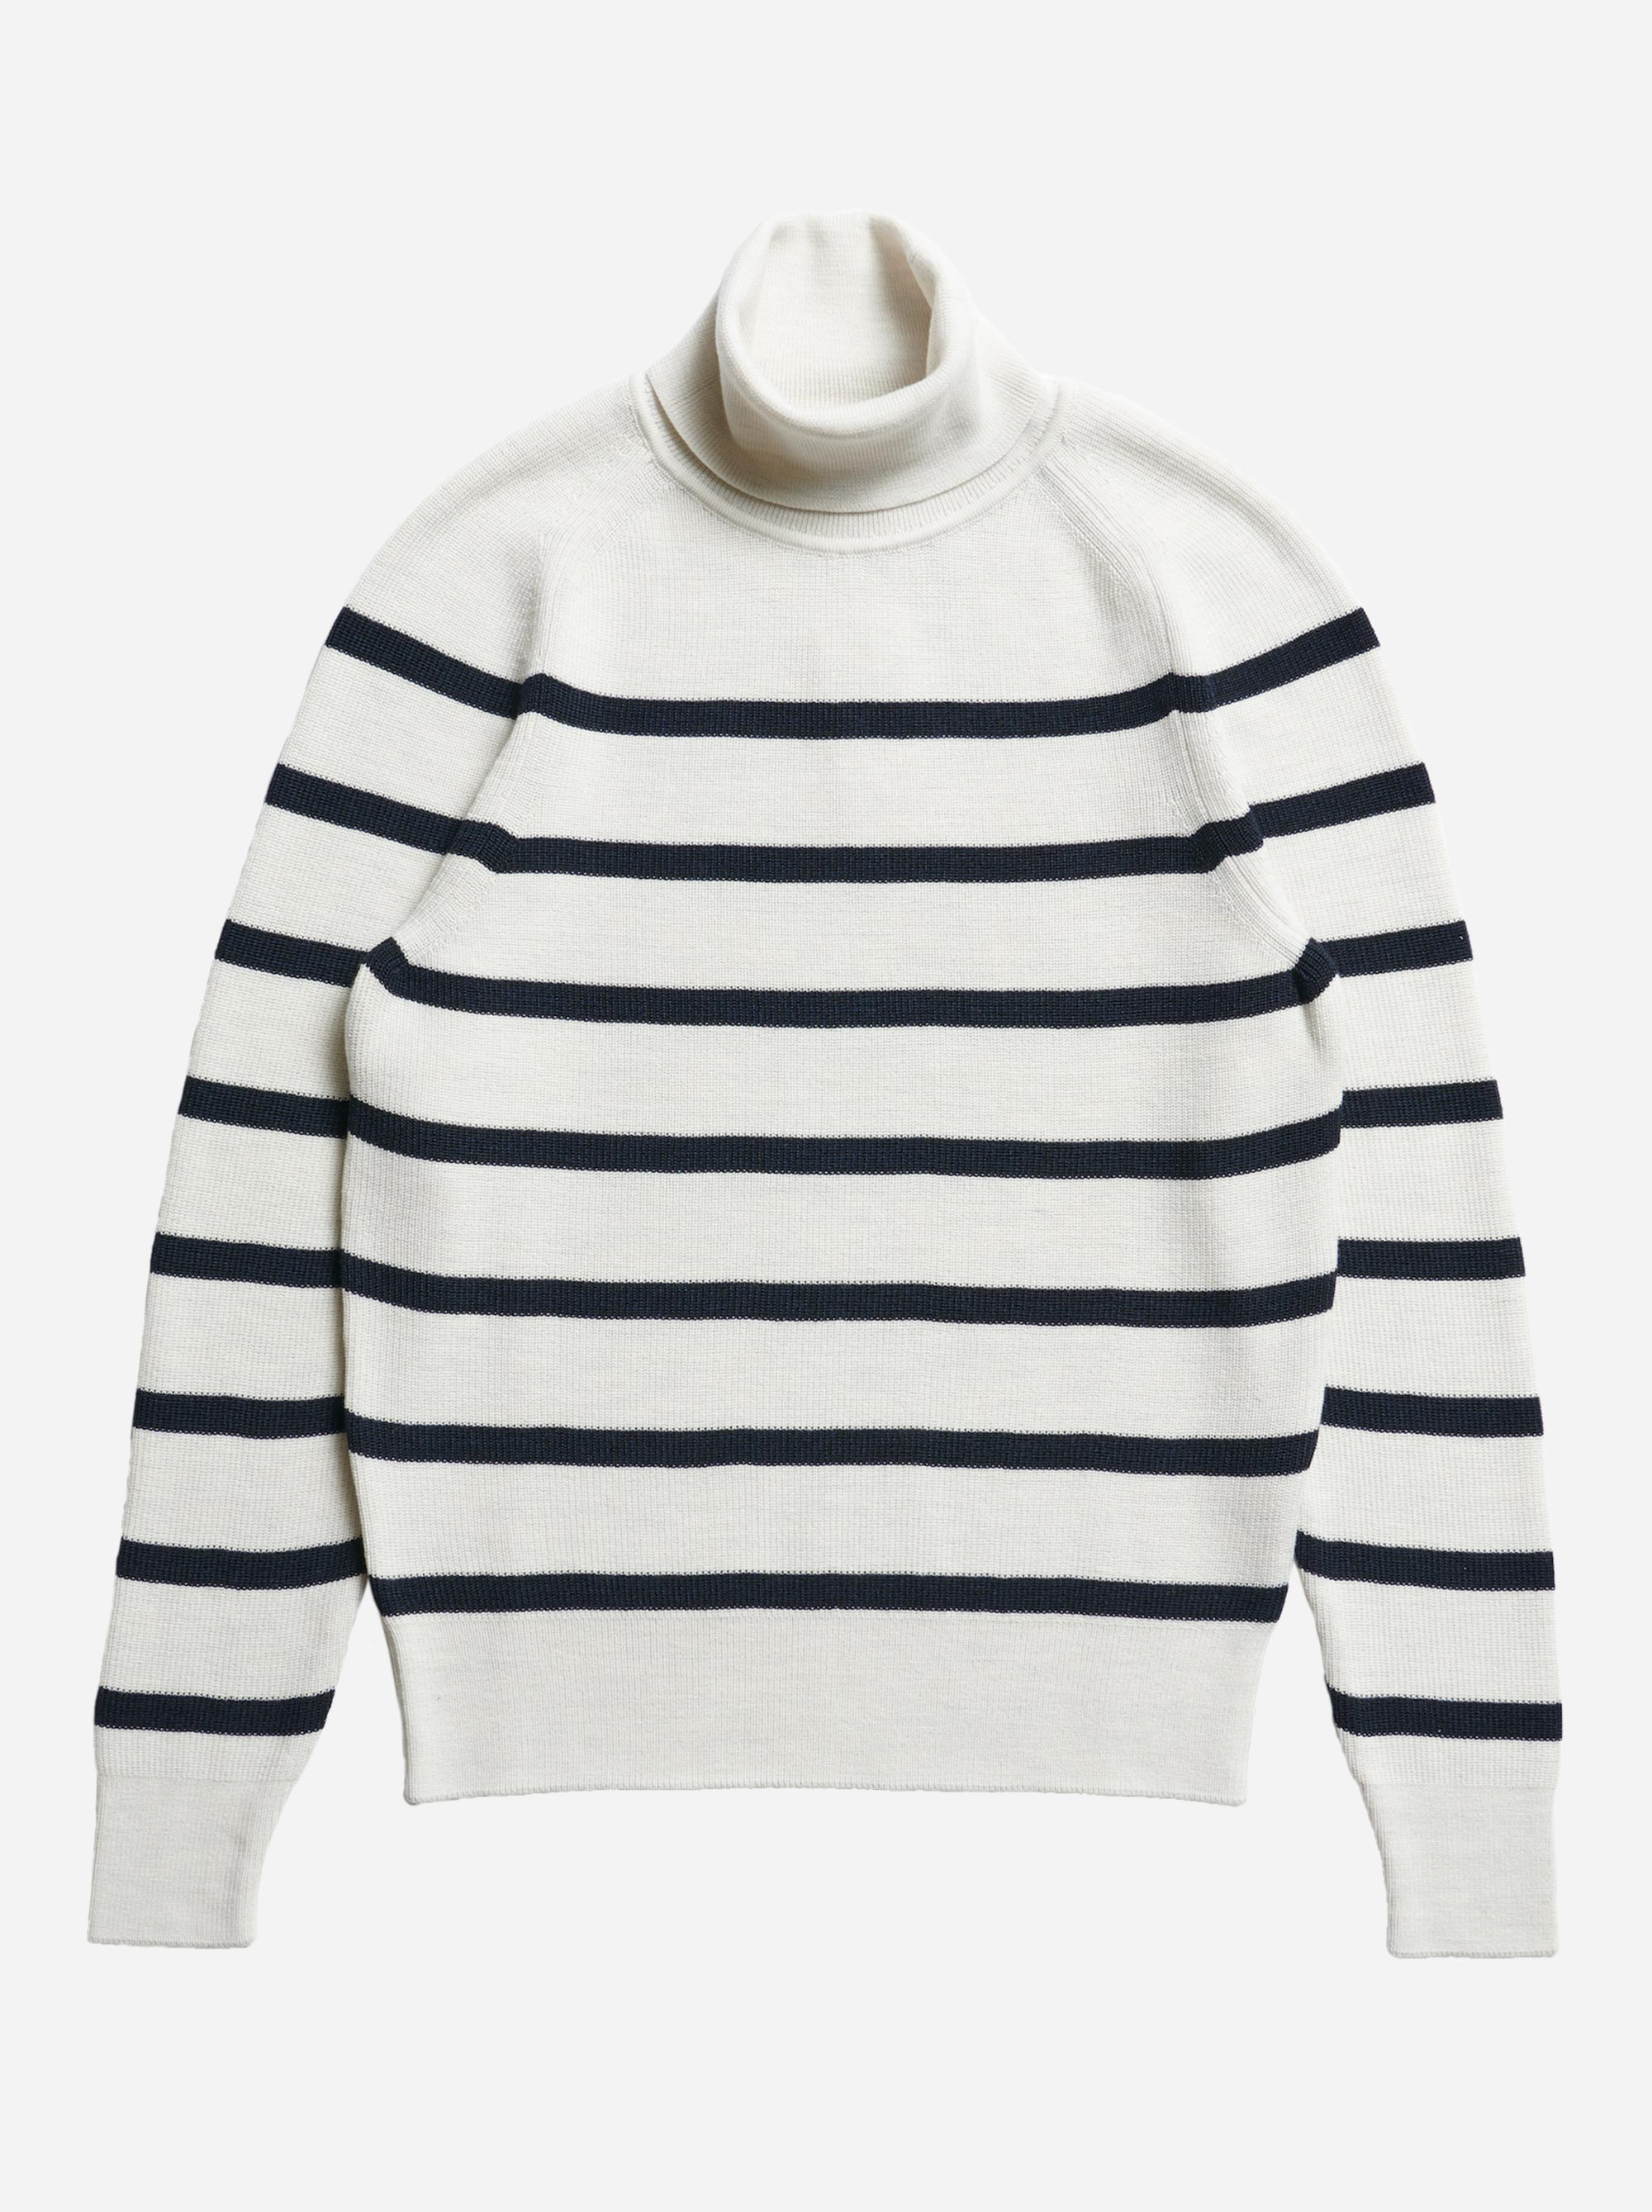 Teym - Turtleneck - The Merino Sweater - Men - Striped - 4